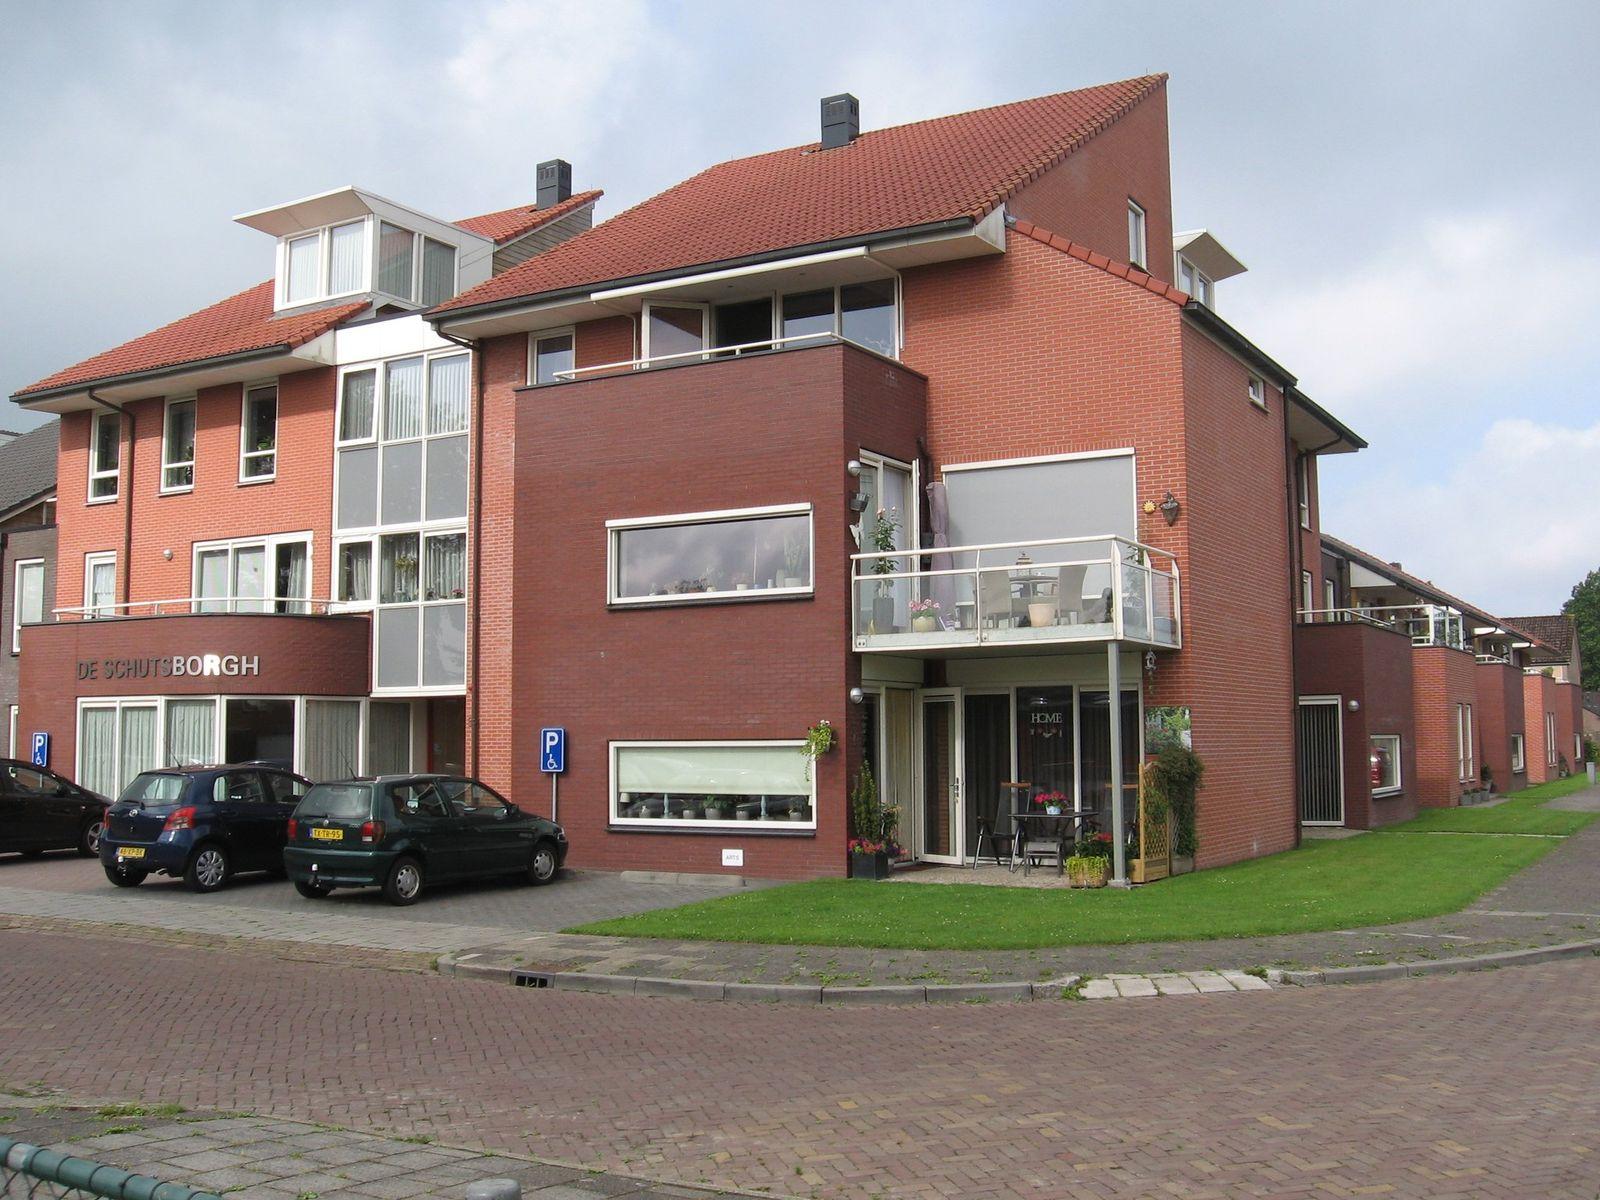 Jan Naardingweg 5--202, Noordscheschut